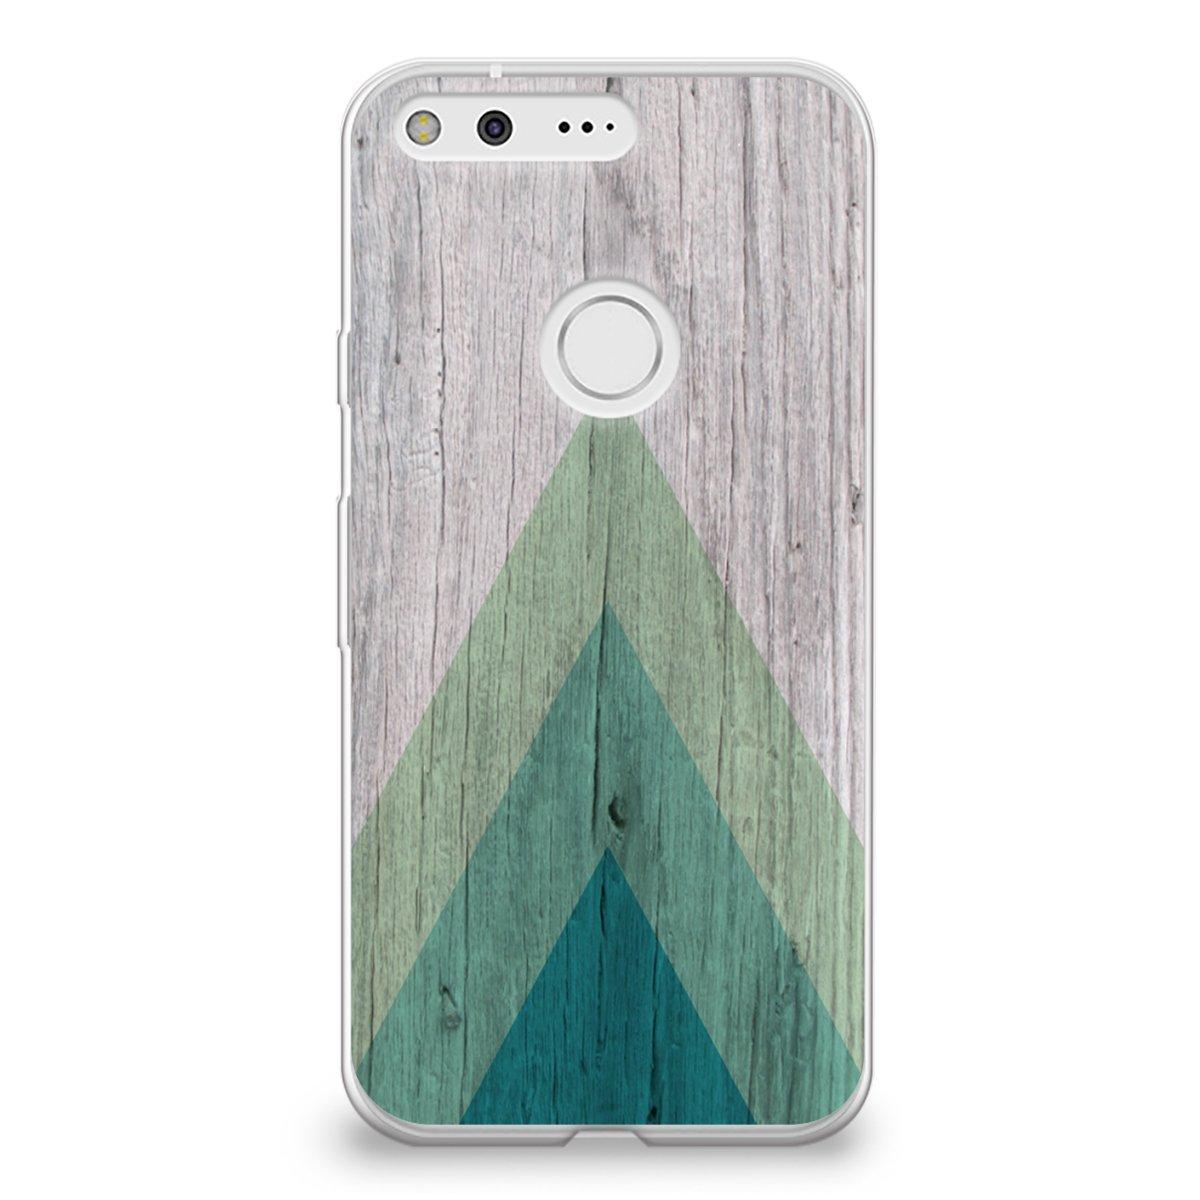 huge discount 1df4b 3cdf9 CasesByLorraine Google Pixel Case, Wood Print Geometric Triangle Pattern  Case Flexible TPU Soft Gel Protective Cover for Google Pixel (S01)